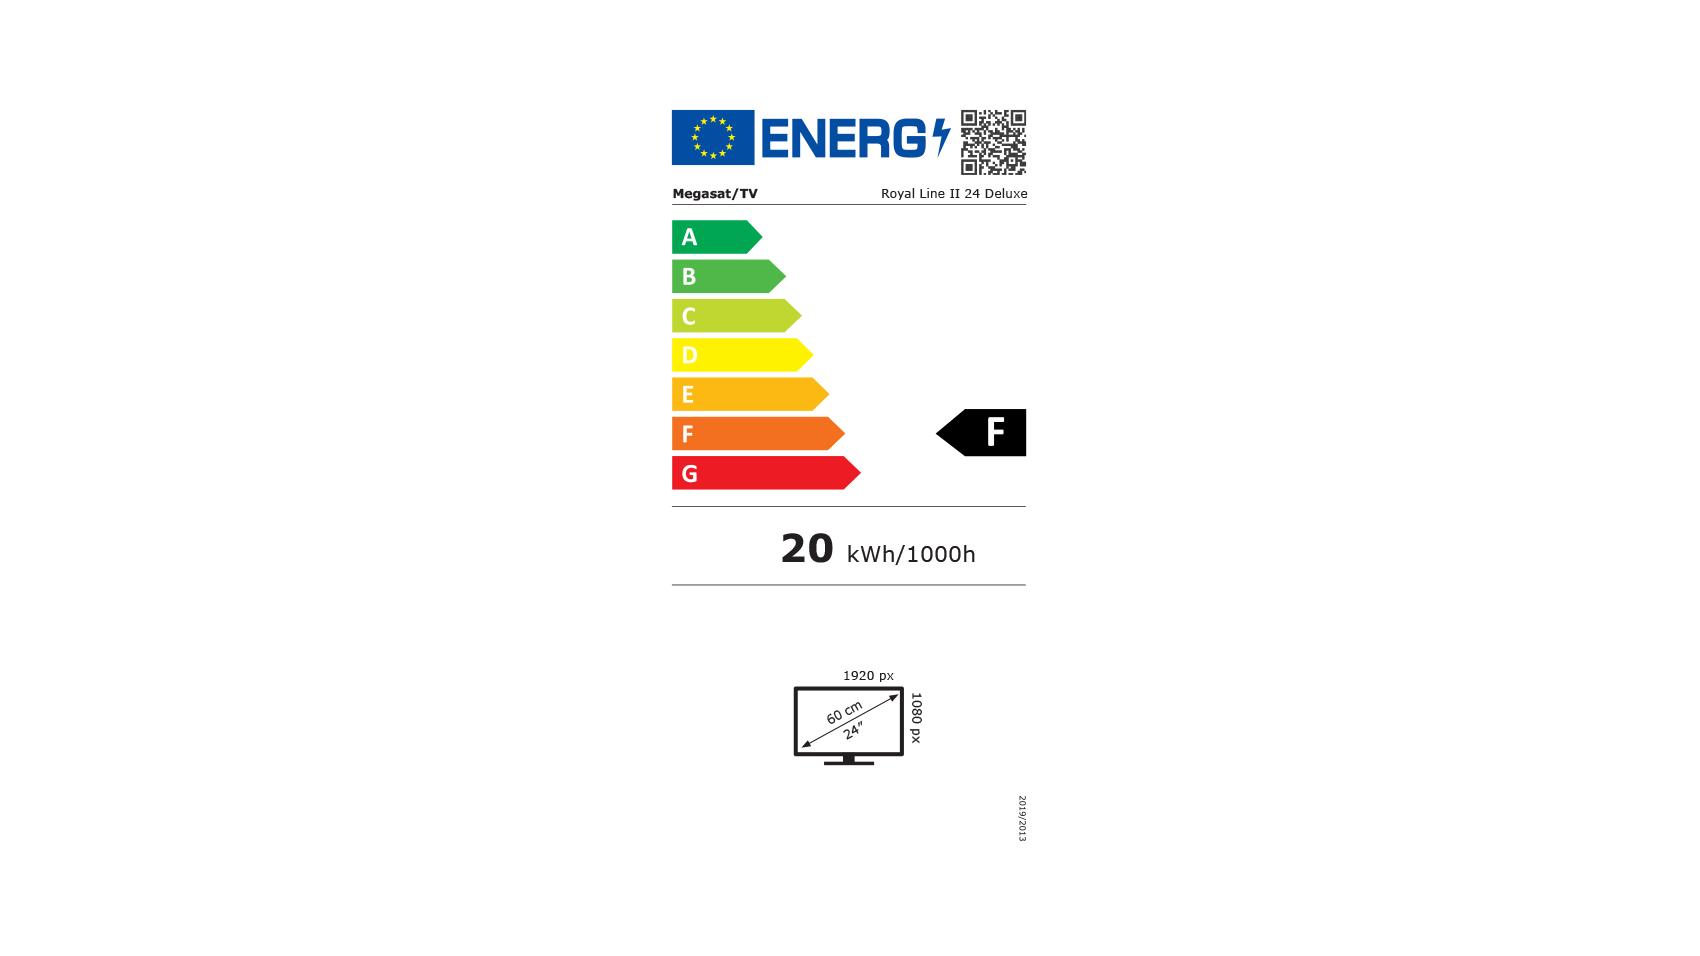 megasat_royal_line_2_24_deluxe_energielabel_2021